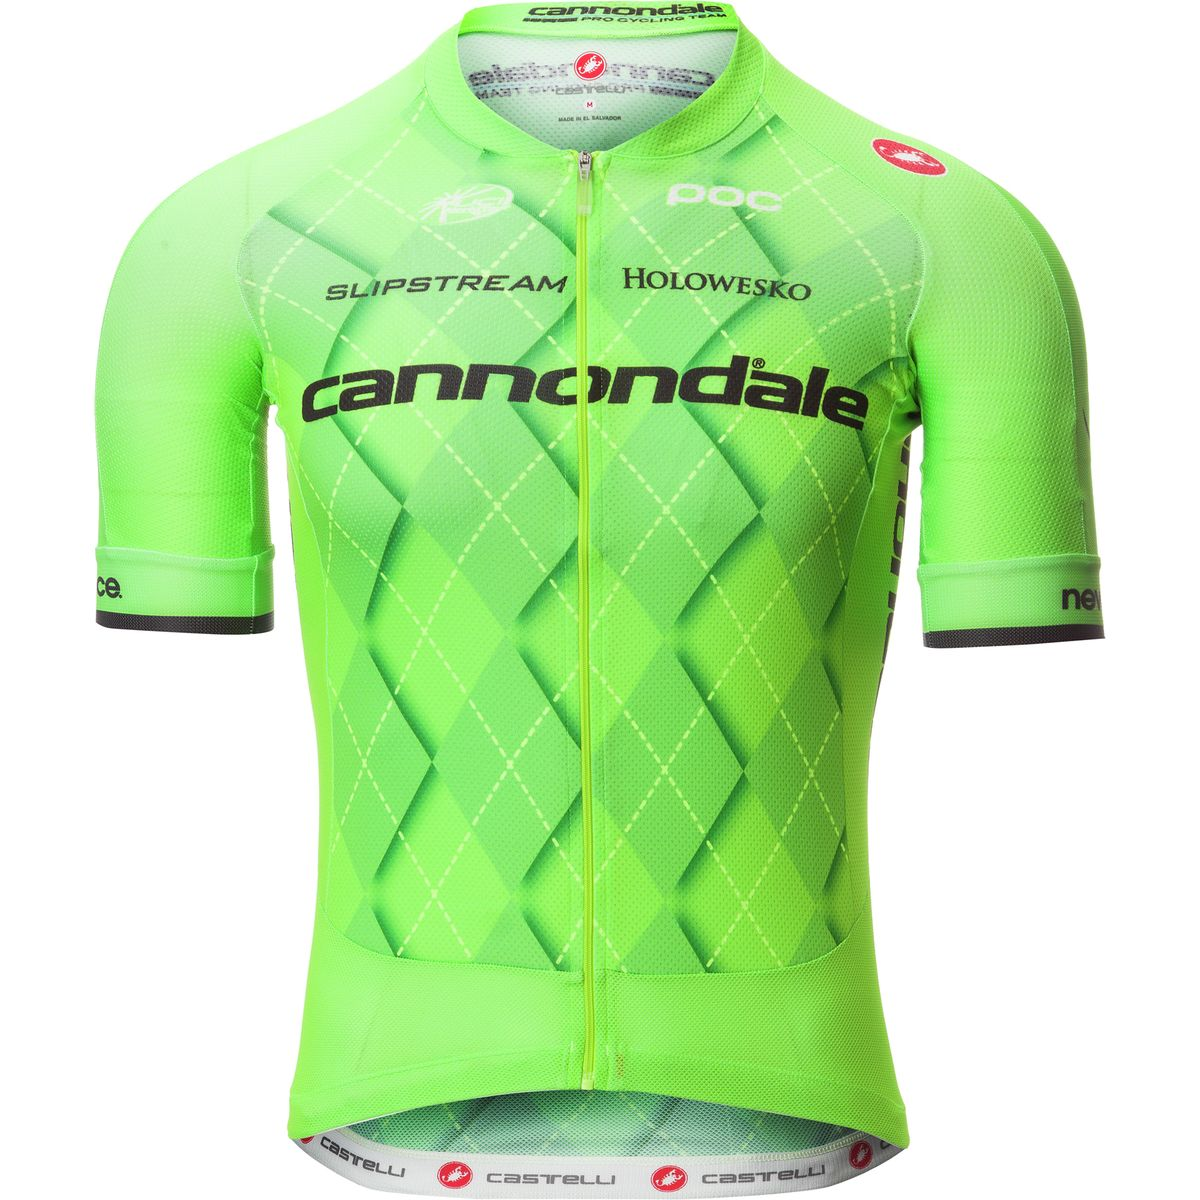 Castelli Cannondale Aero Race 5.1 Jersey Sprint Green